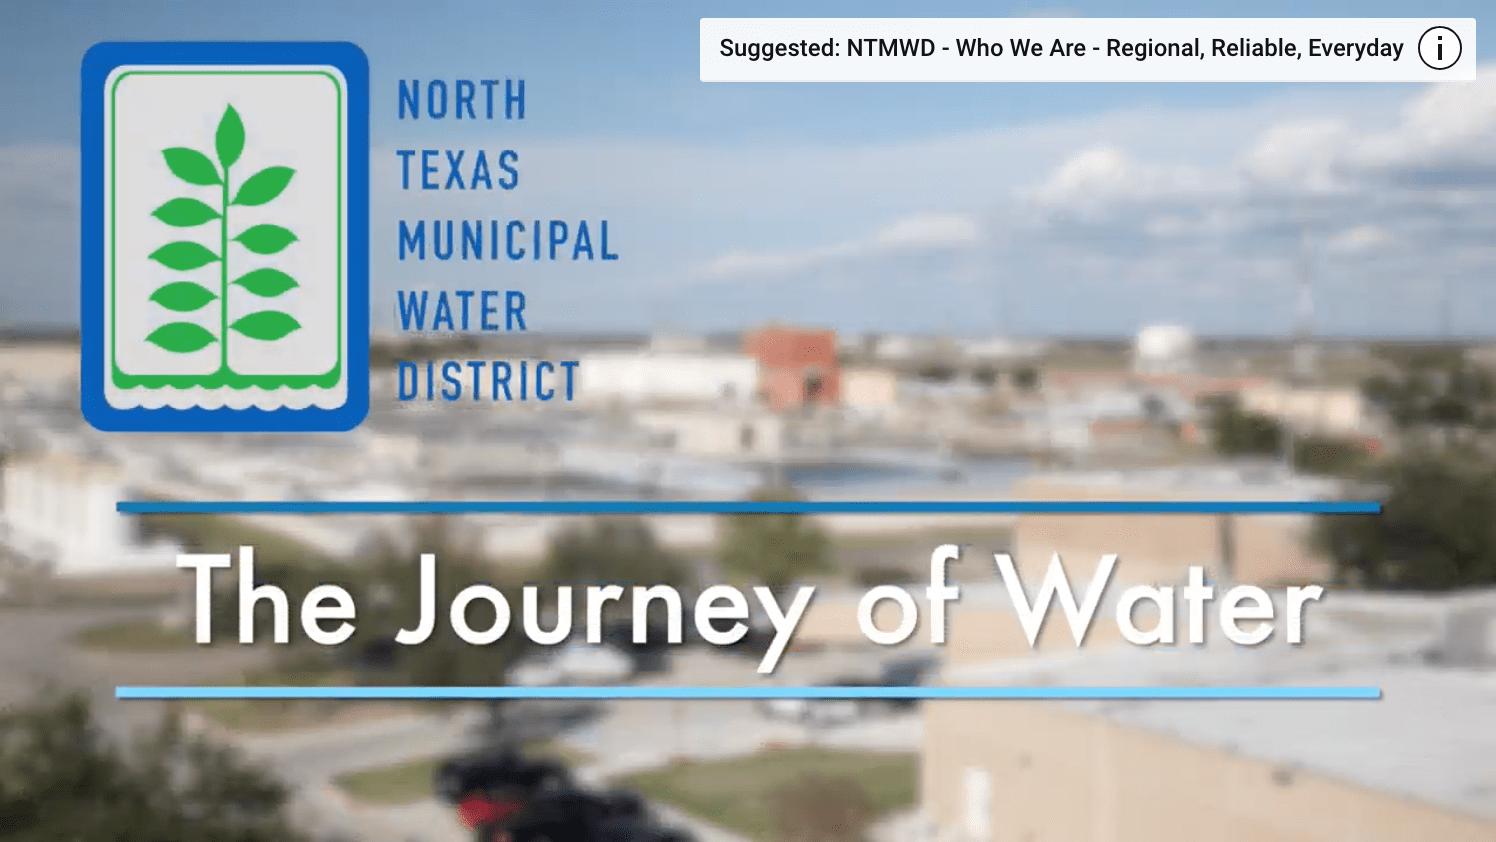 NTMWD - North Texas Municipal Water District